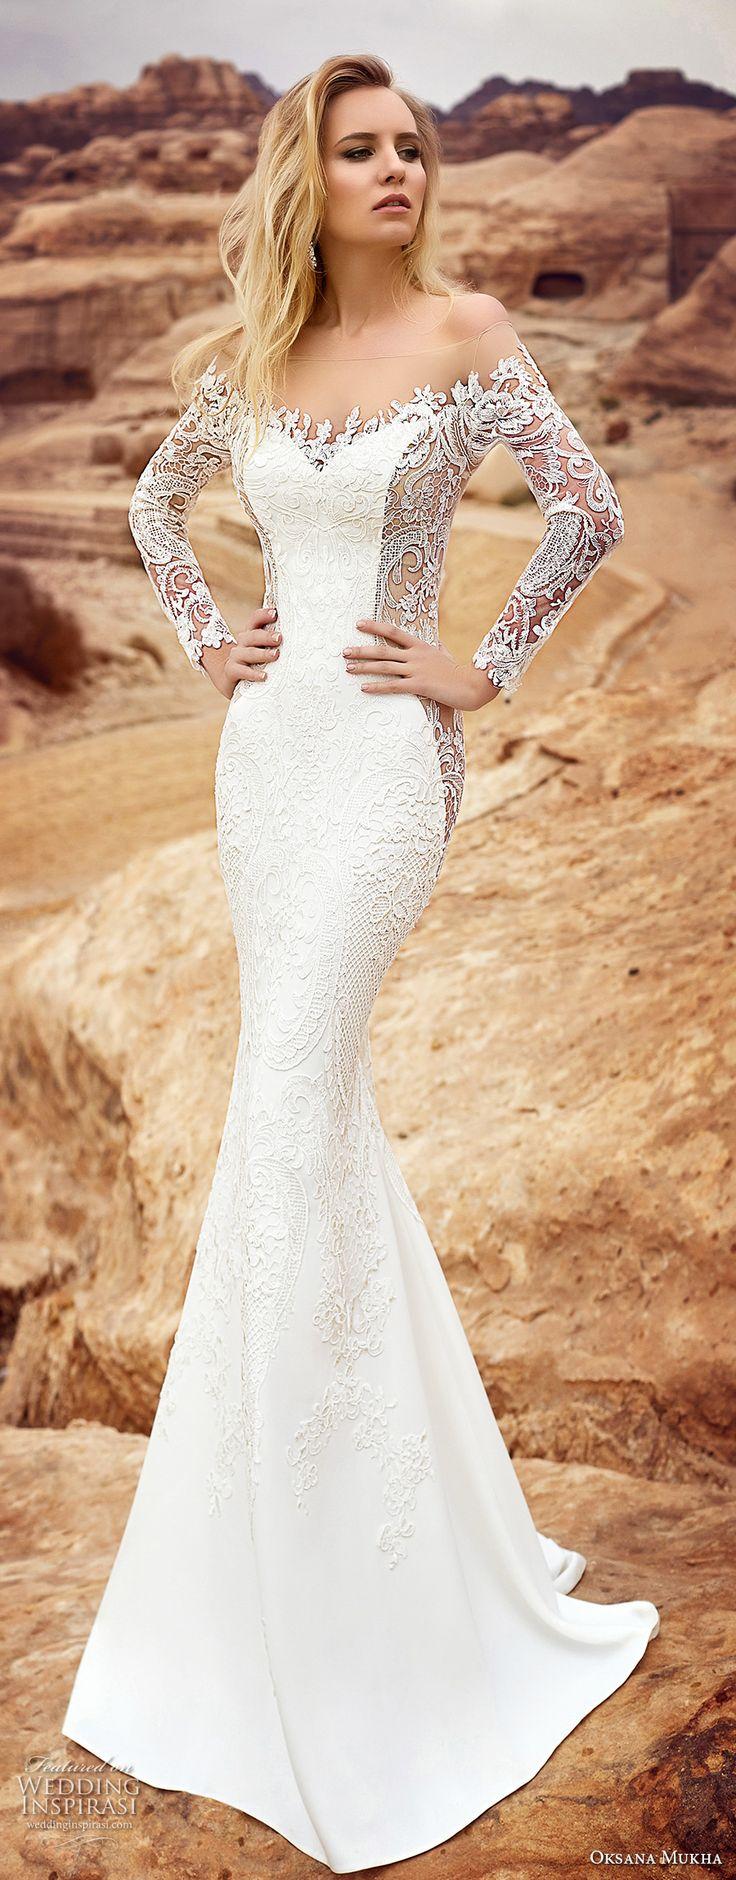 oksana mukha 2018 bridal long sleeves off the shoulder sweetheart neckline full embellishment elegant glamorous fit and flare wedding dress sheer lace back sweep train (armadea) mv